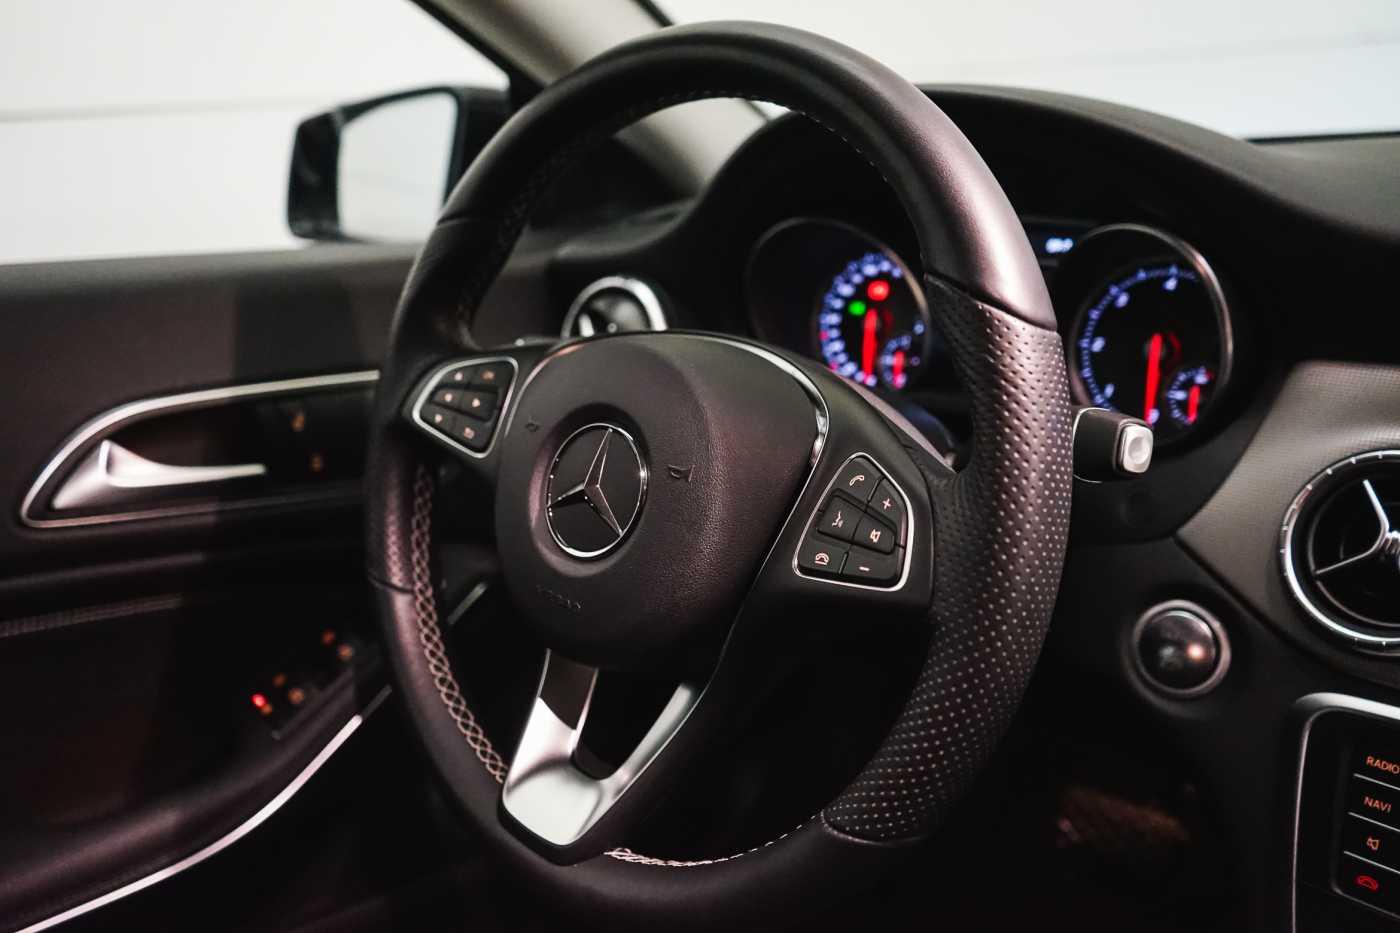 Mercedes CLA 200 d //Camera, Airco, Navi 15/33